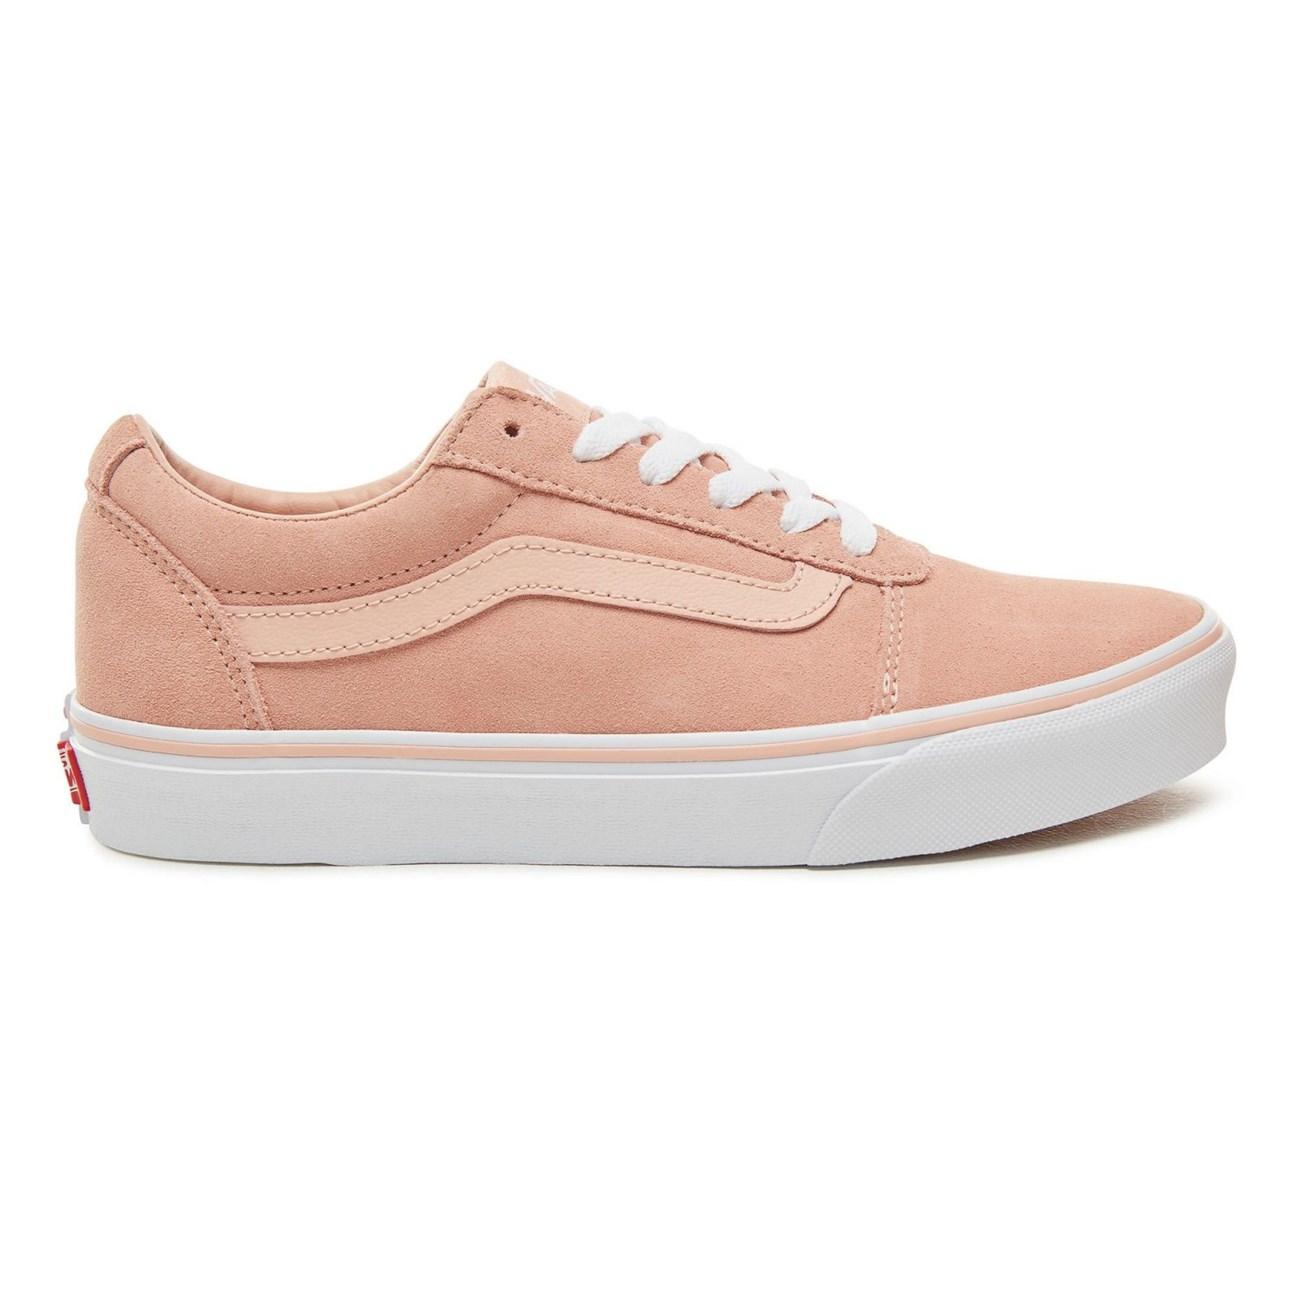 3b29e93962 VANS WARD W   Sportstyle Παπούτσια